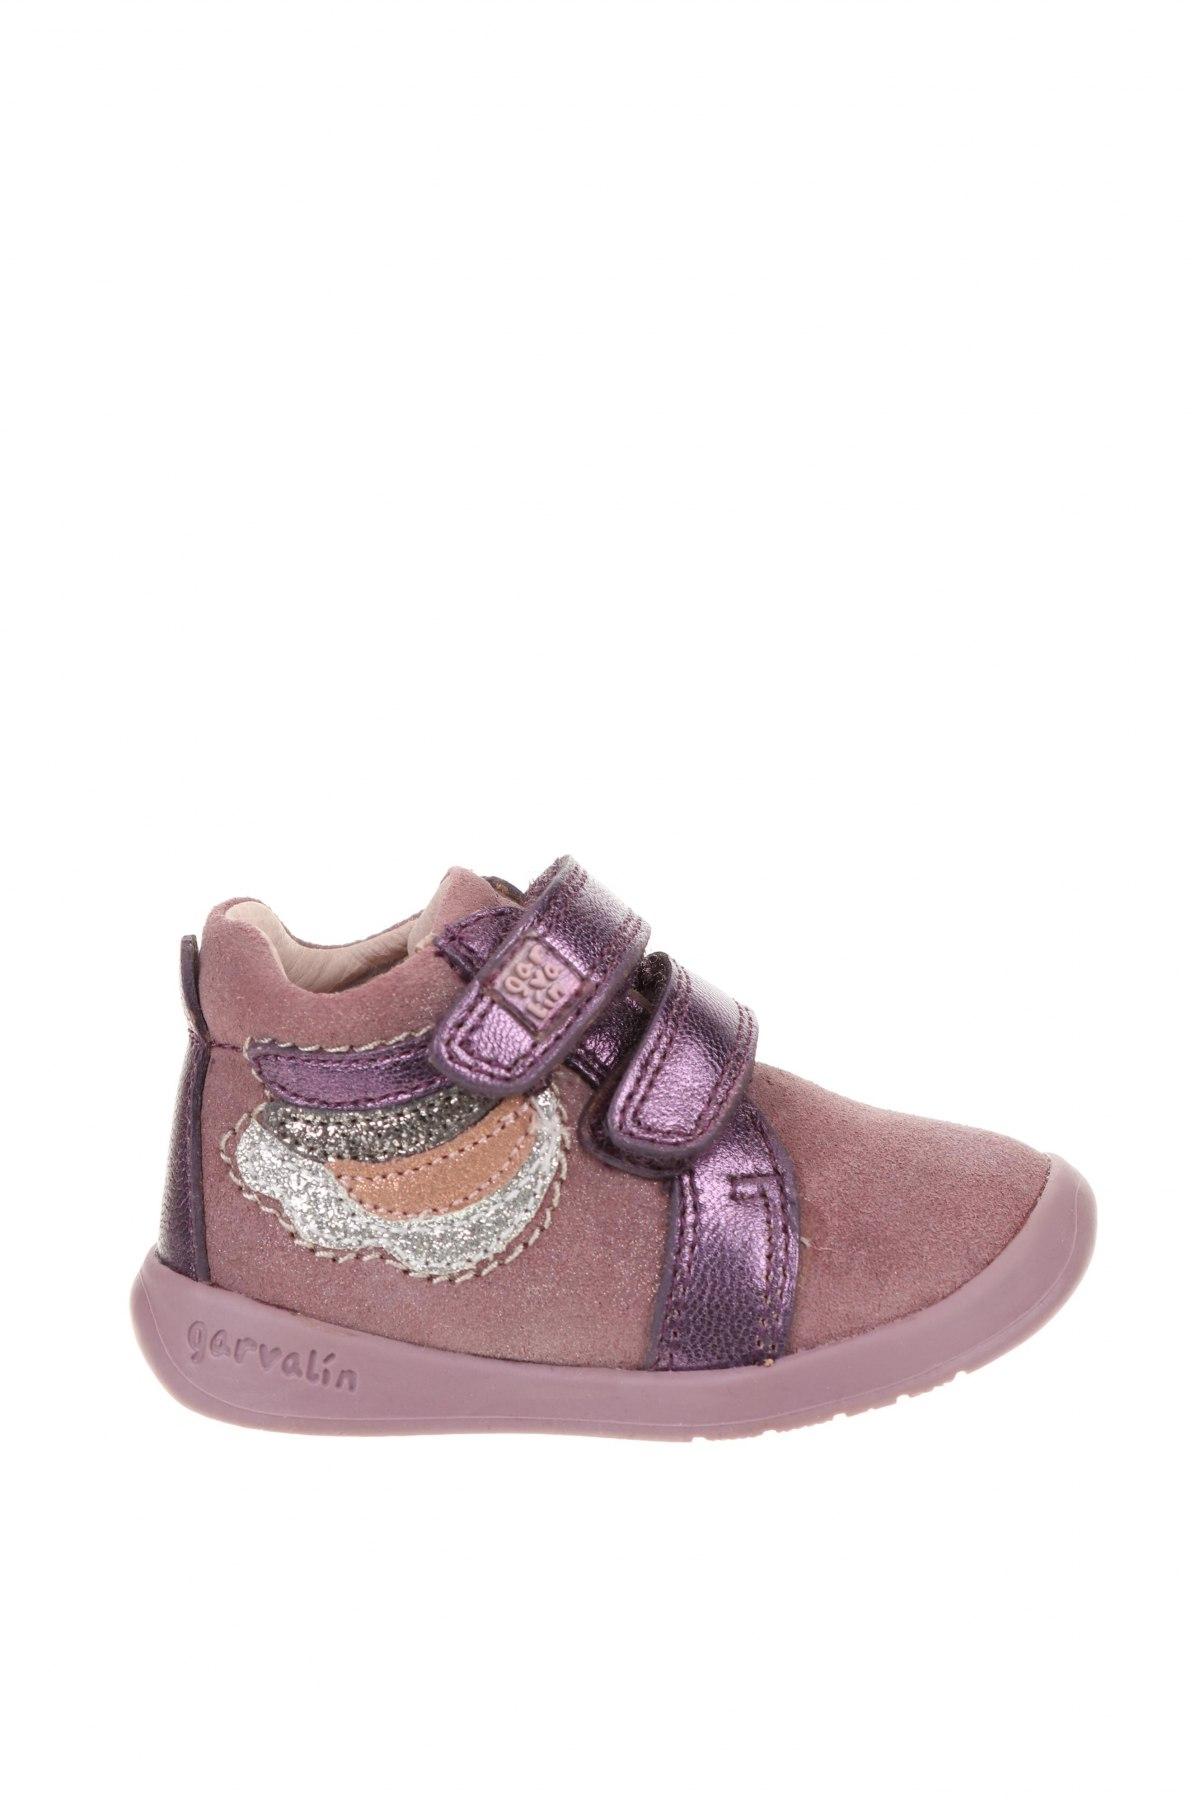 Детски обувки Garvalin, Размер 19, Цвят Лилав, Естествена кожа, естествен велур, Цена 33,60лв.